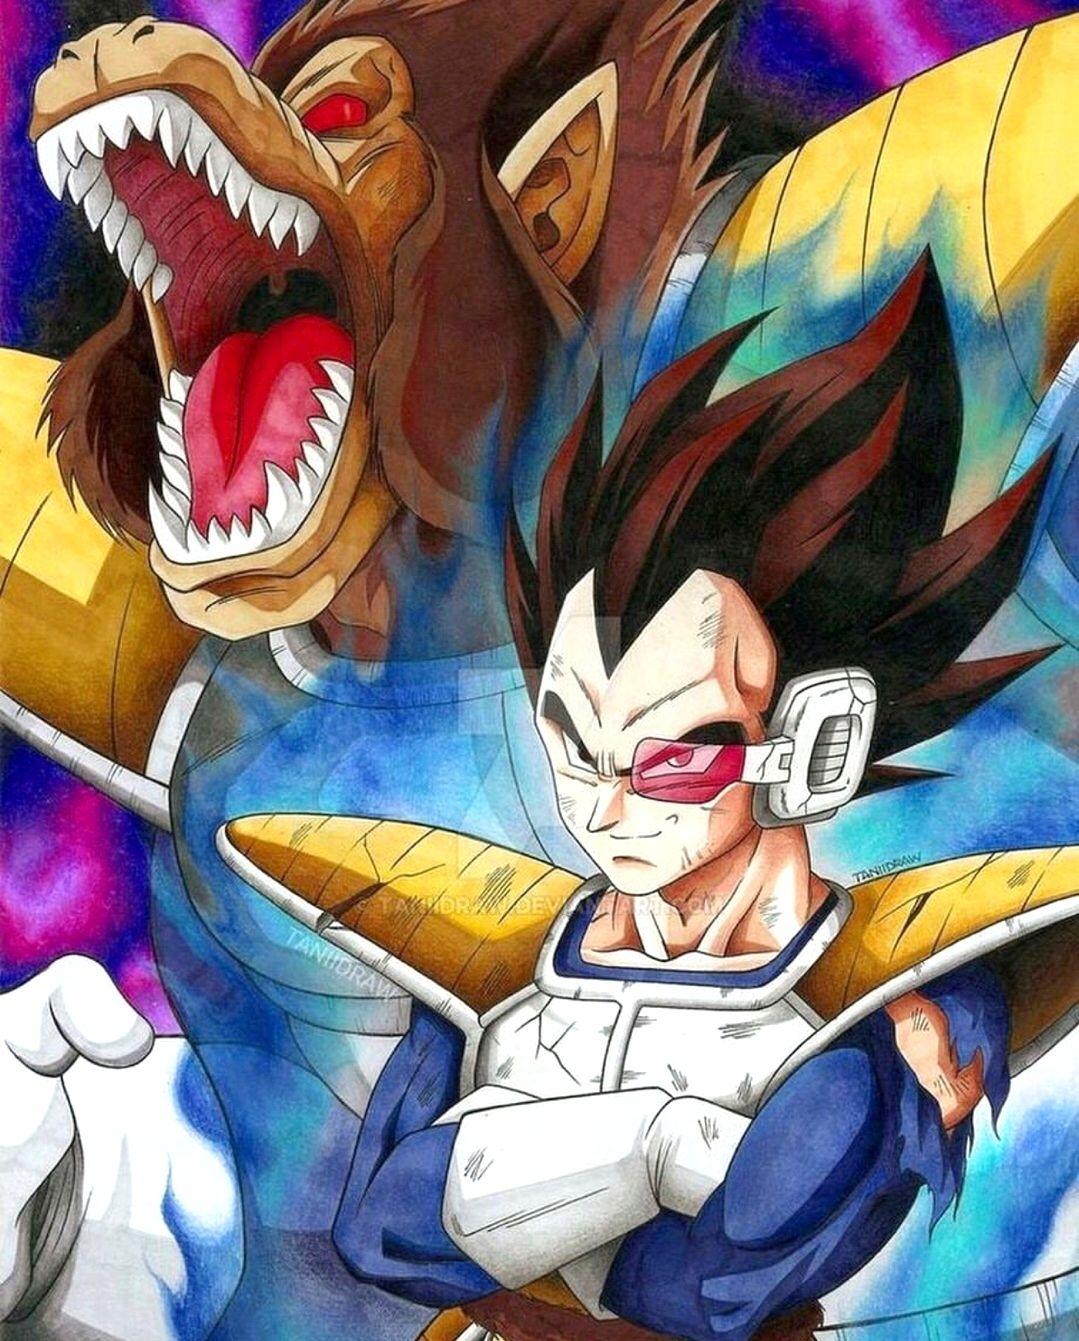 Dragonball Z Lover Follow My Instagram If You Love Dragonball Z Anime Dragon Ball Super Dragon Ball Artwork Dragon Ball Art